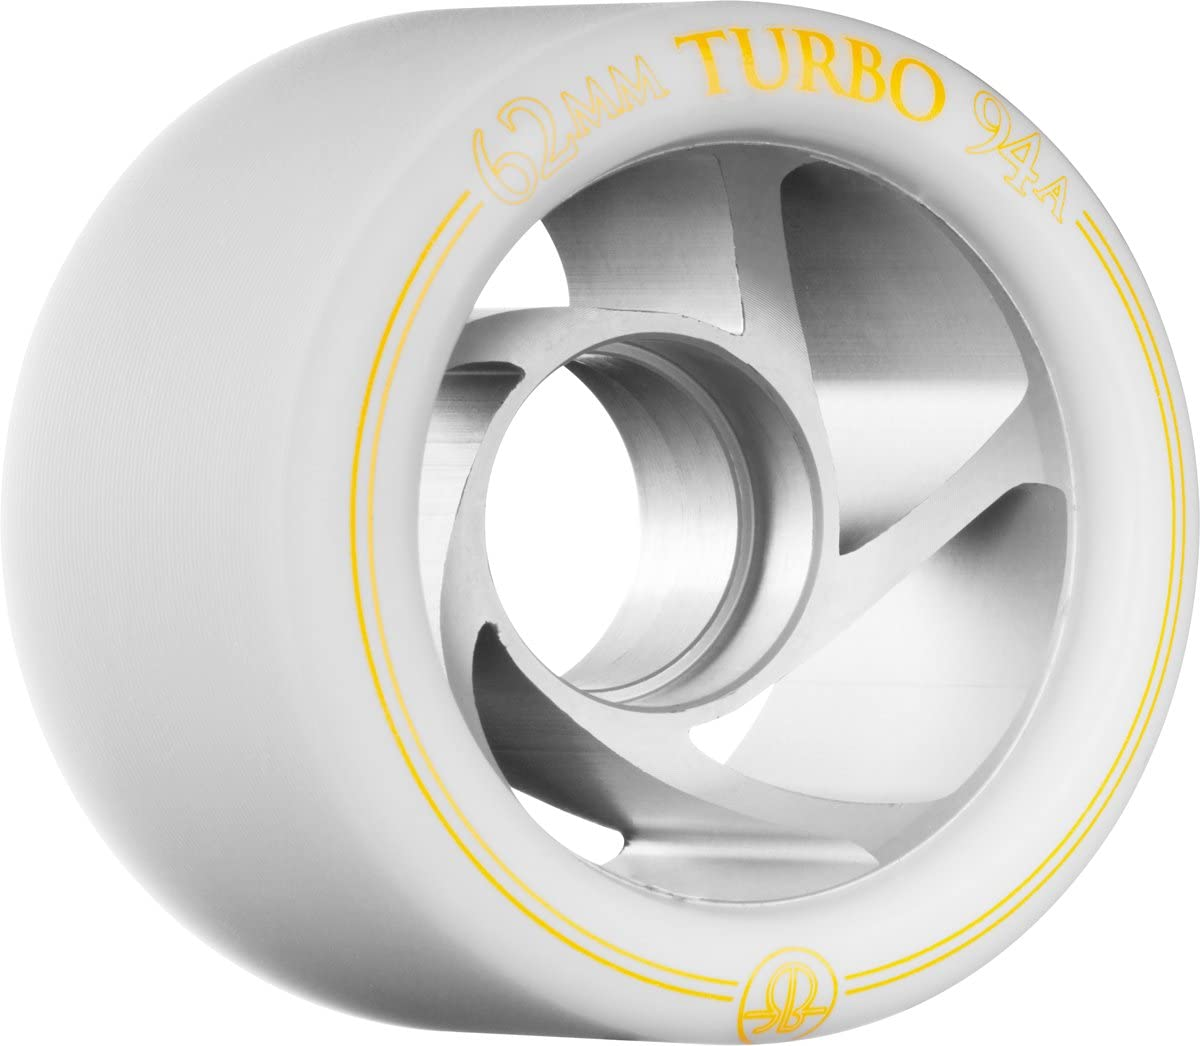 RollerBones Turbo Speed//Derby Clear Aluminum hub Set of 8 Rollerskate Wheels Skate One Corp WRAACMTUR6294A8